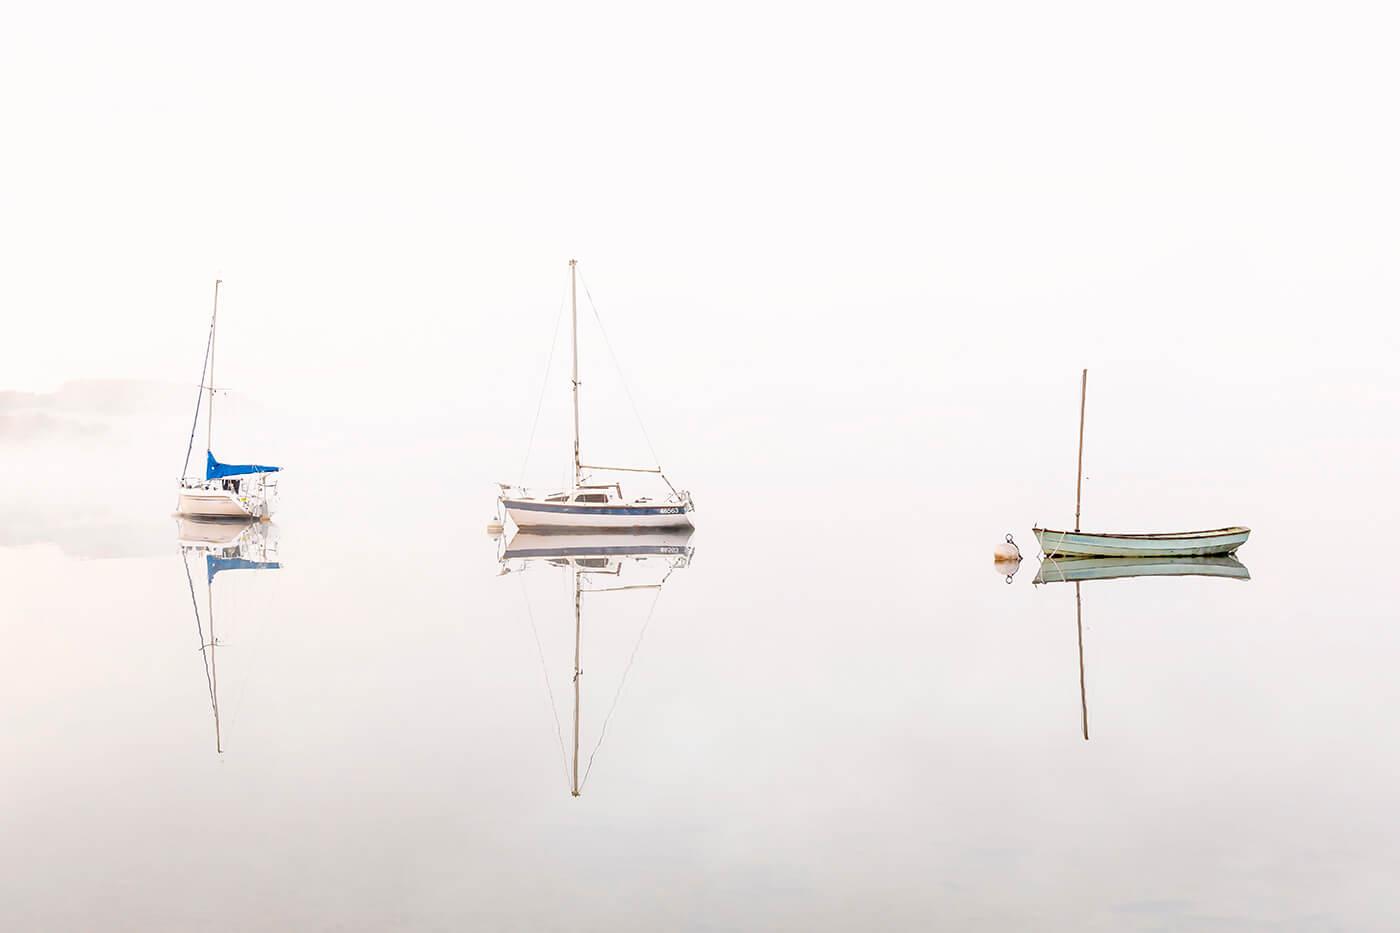 Waterhead , Windermere, Lake District, Cumbria, Melvin Nicholson Photography